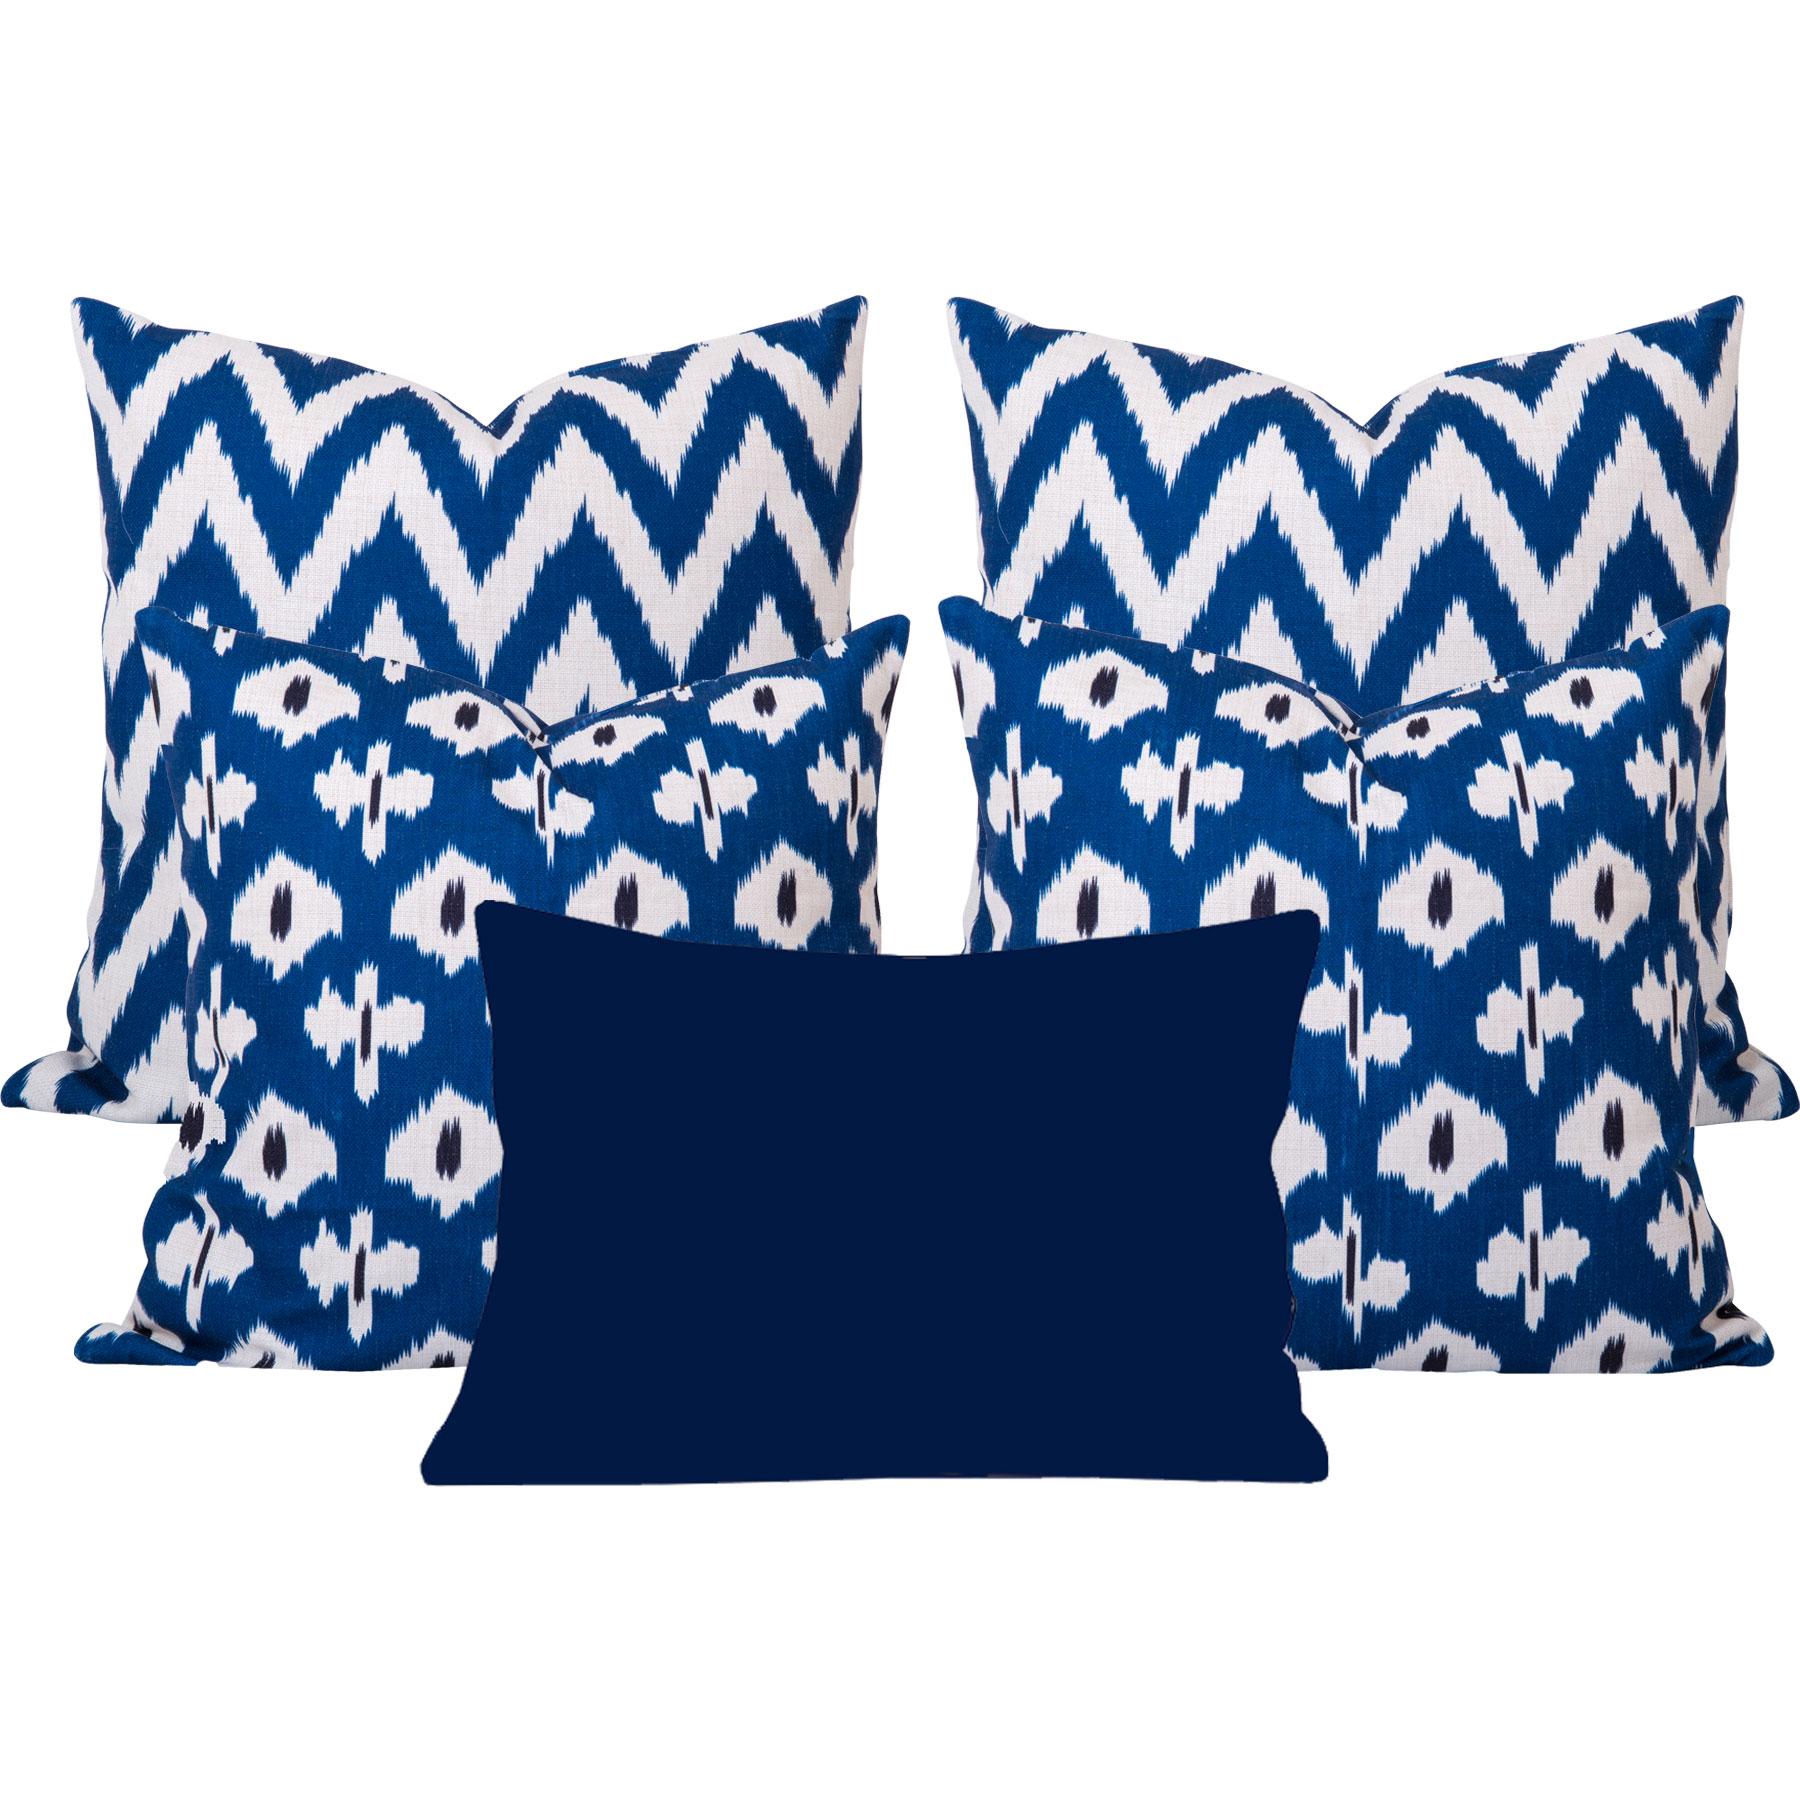 Kristine-Gaia-Blue-Ikat-5-Cushion-Set